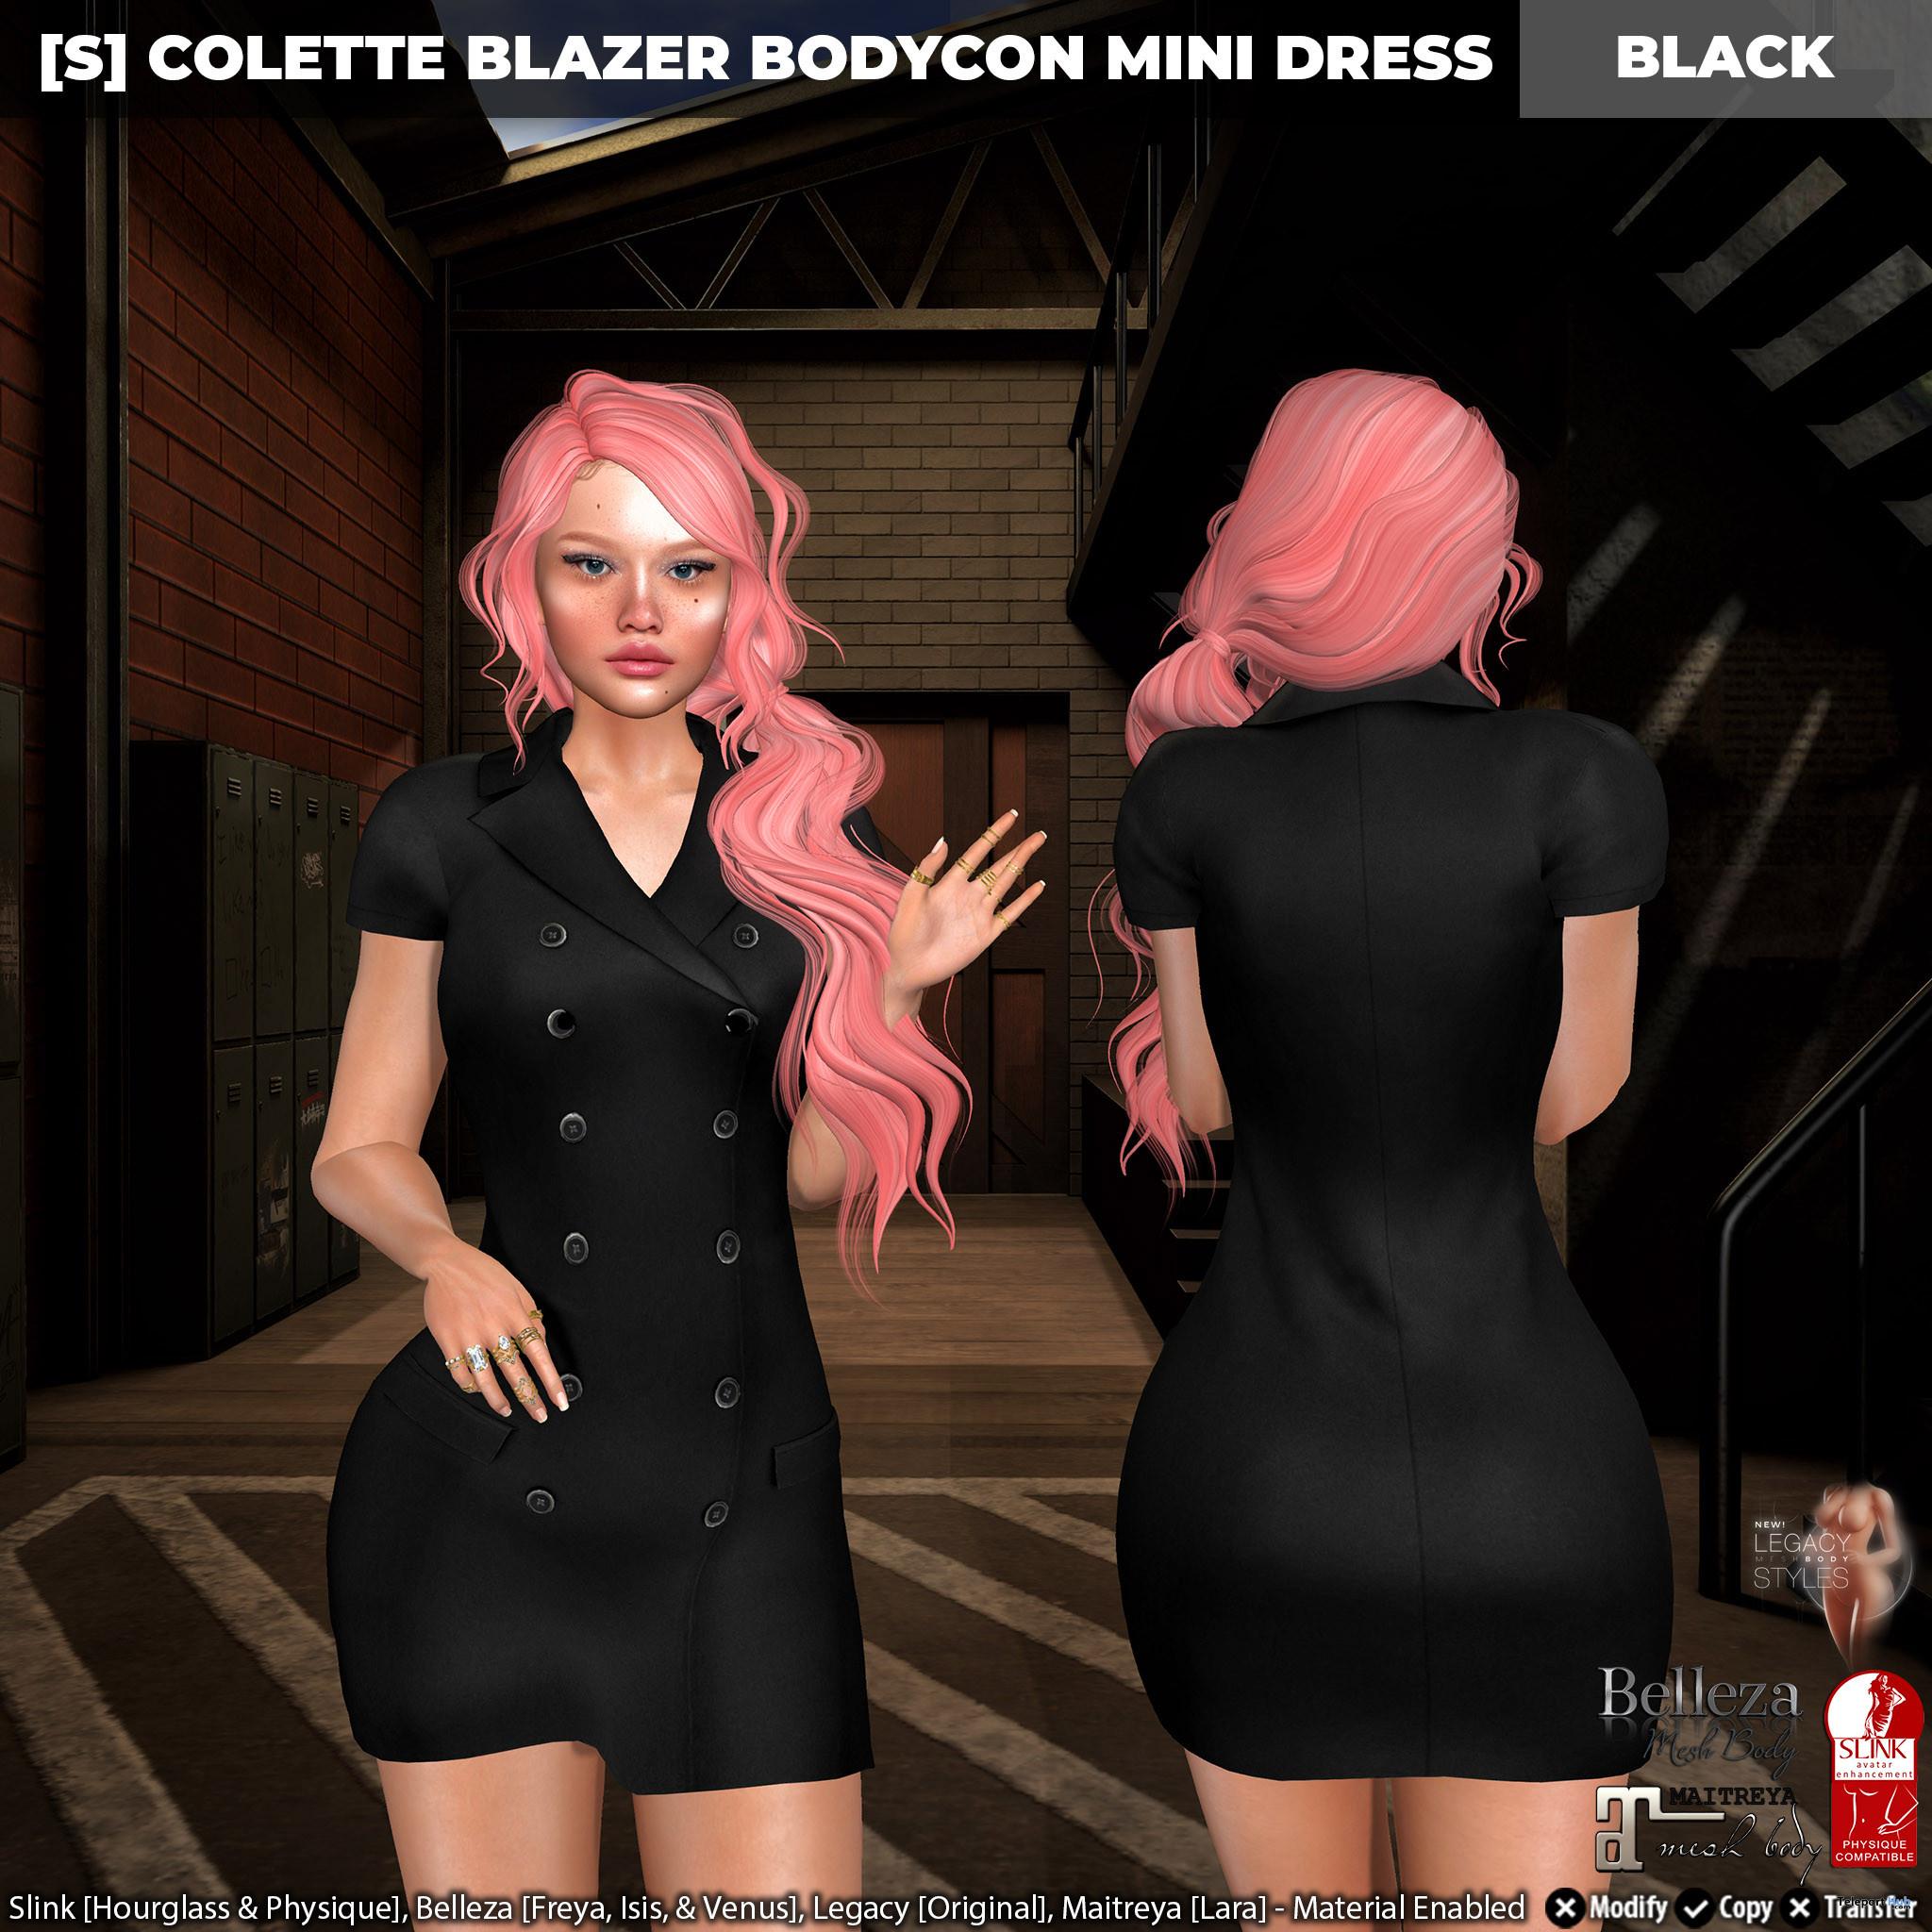 New Release: [S] Colette Blazer Bodycon Mini Dress by [satus Inc] - Teleport Hub - teleporthub.com